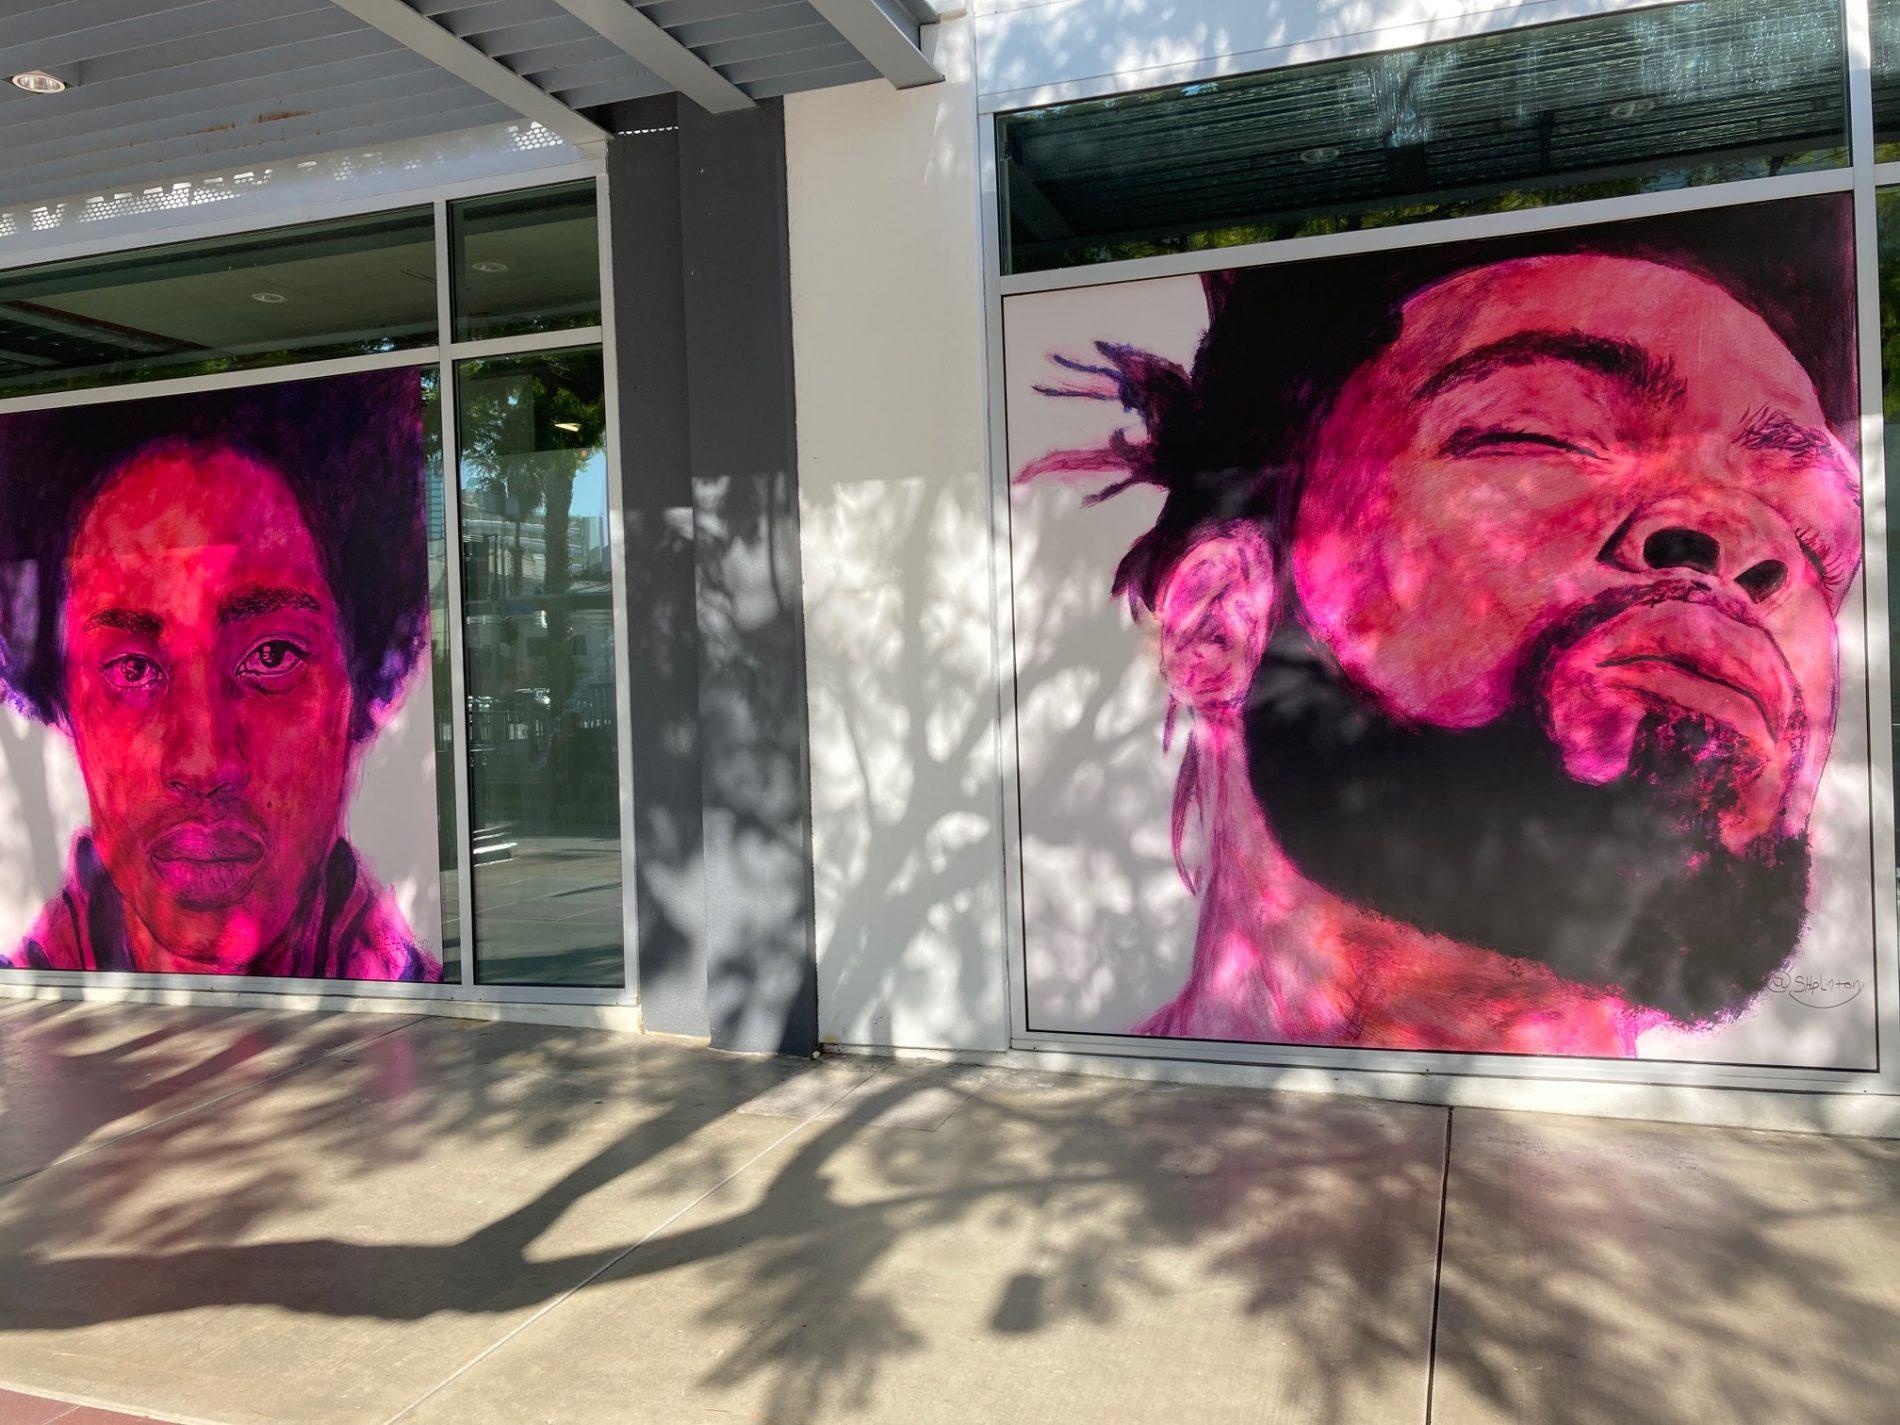 Santa Monica Art of Recovery project, artwork by SHpLinton.